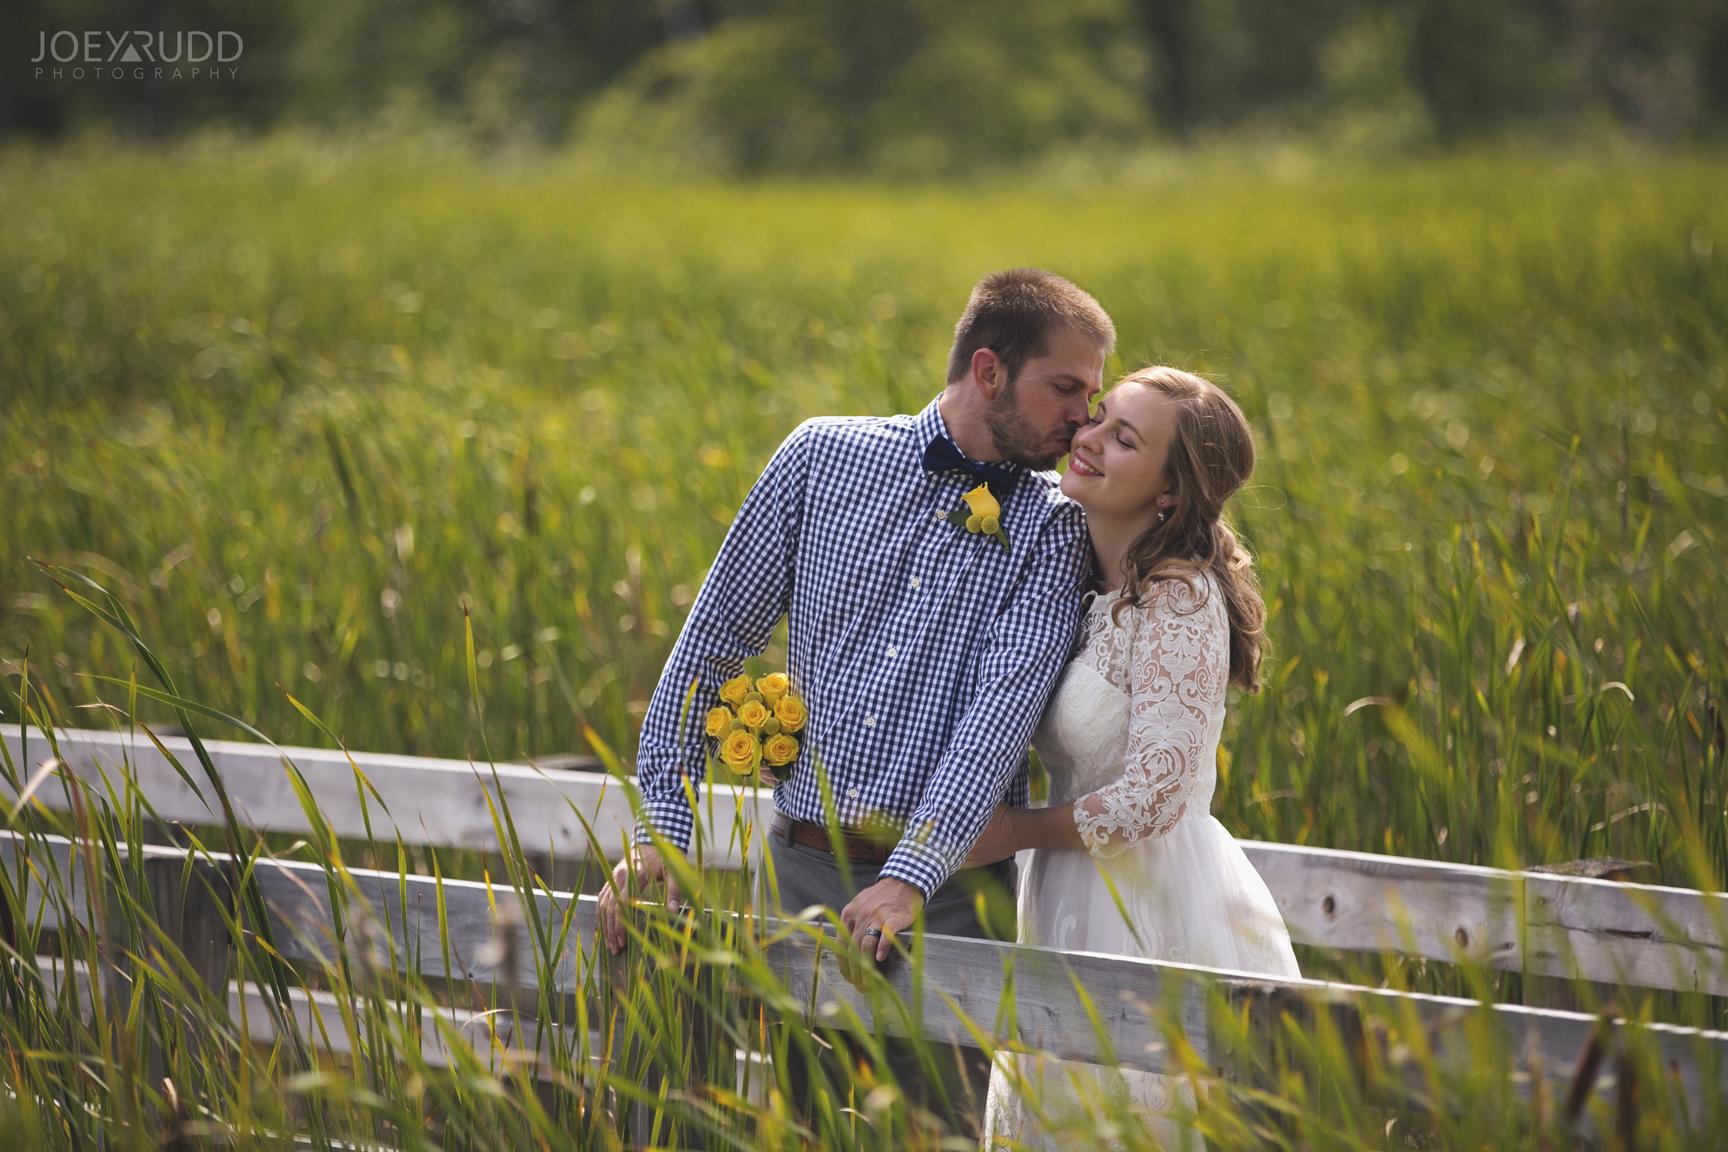 Ottawa Elopement by Joey Rudd Photography Ottawa Wedding Photographer Mer Bleue Ottawa Wedding Chapel Boardwalk